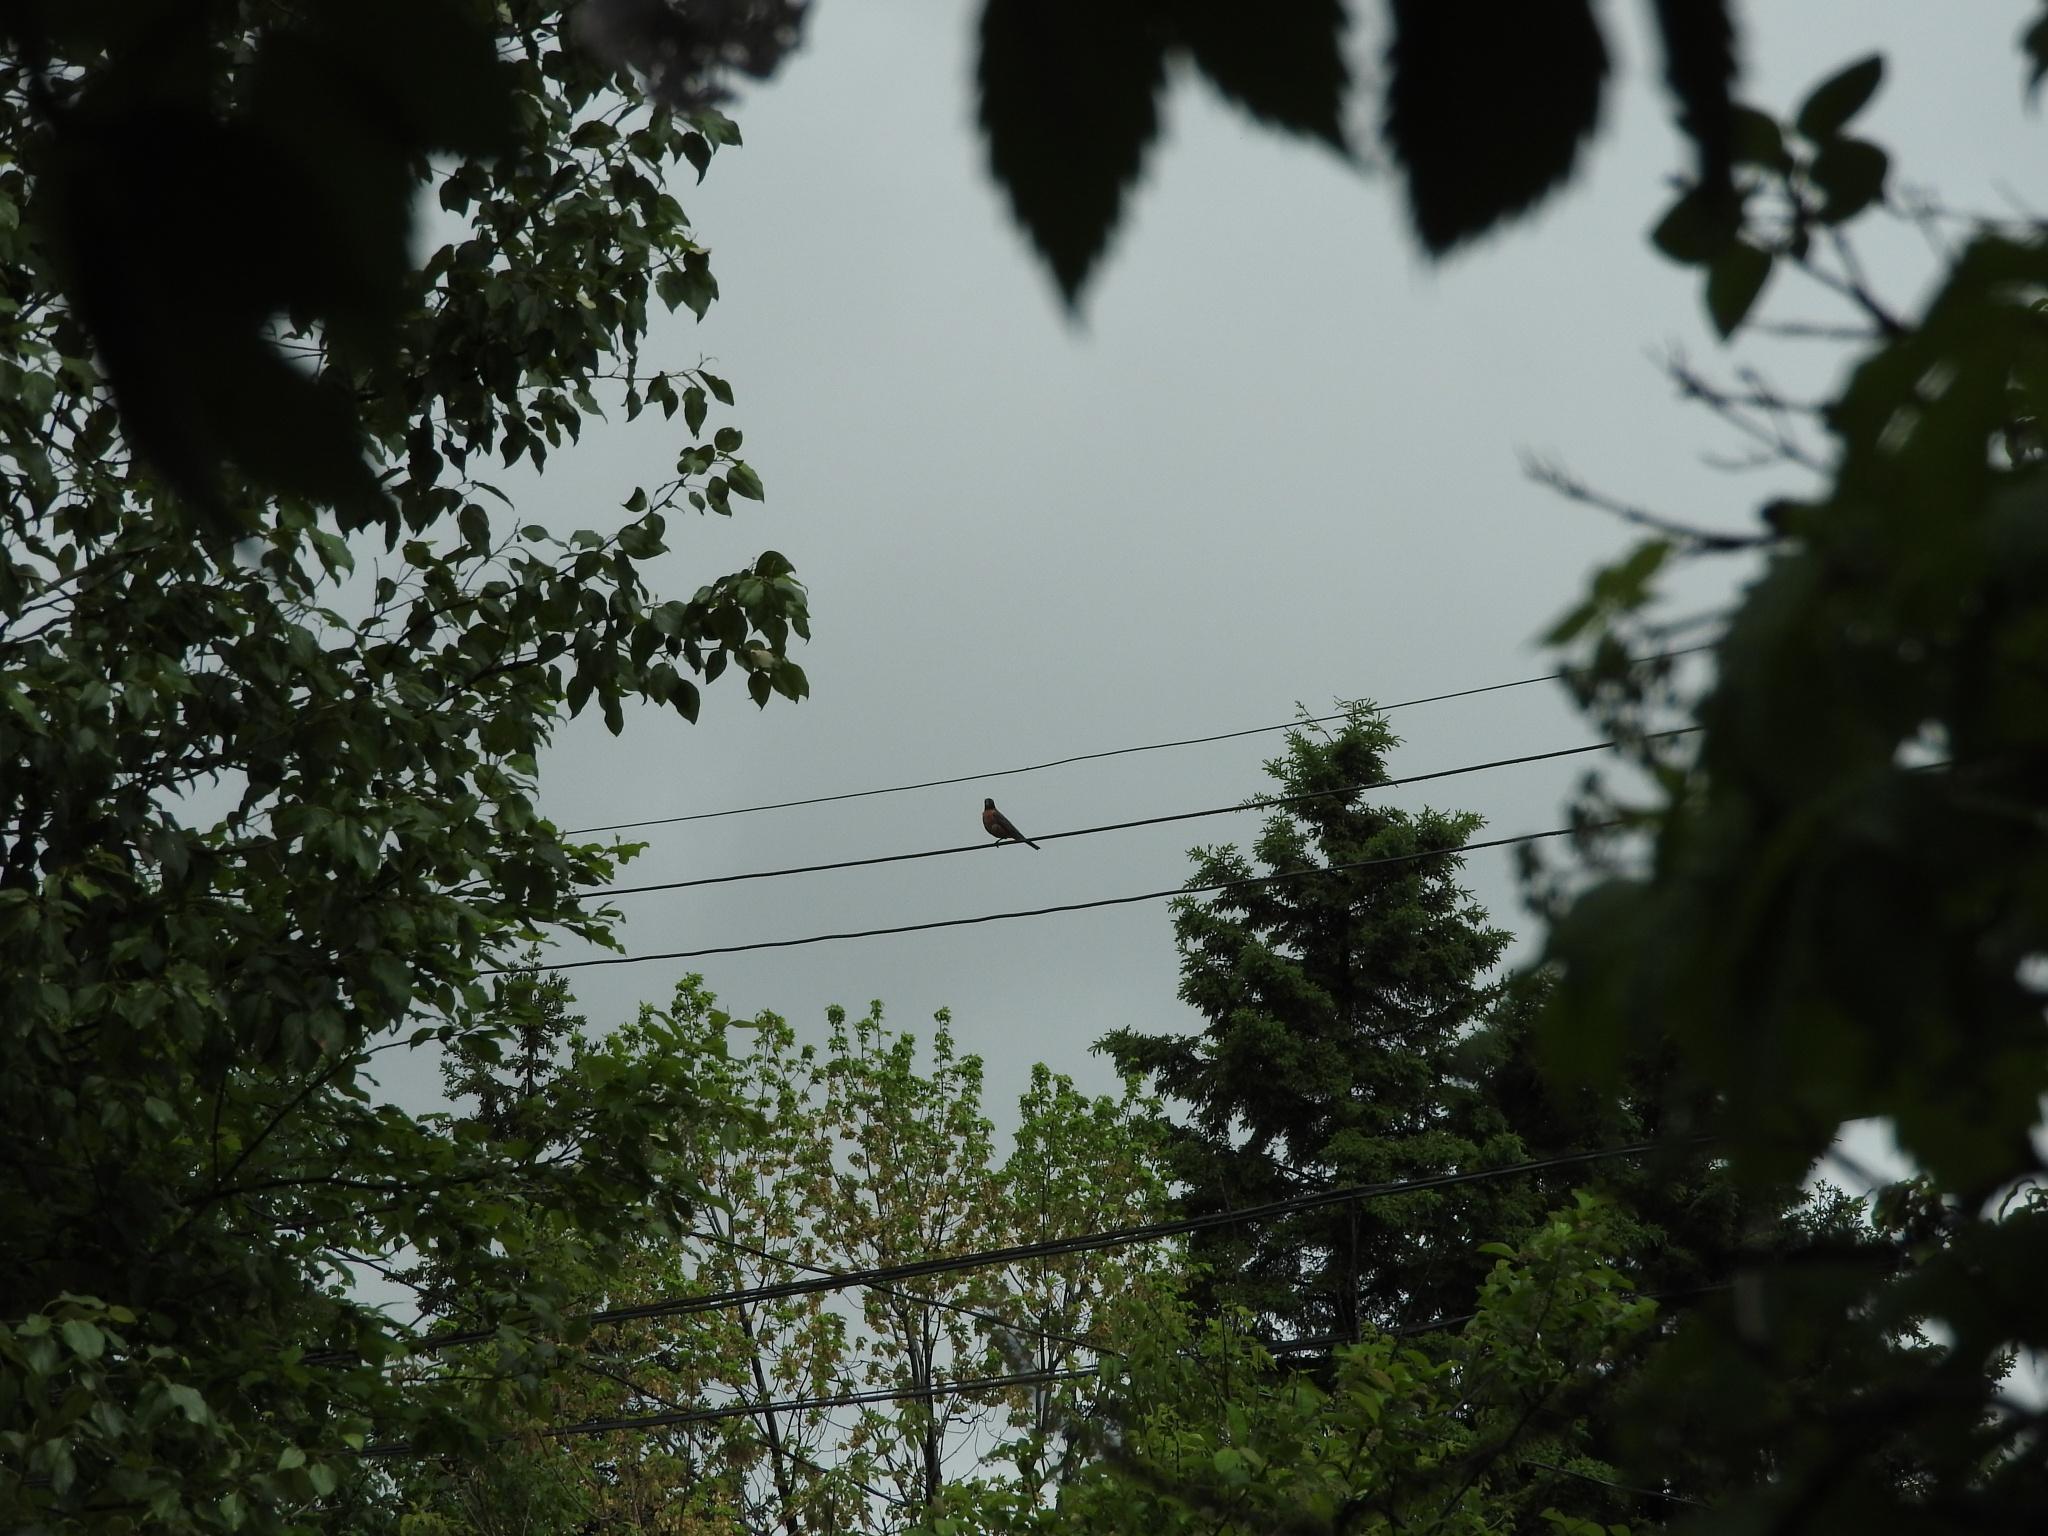 Robin watching over us  by Lorraine Furmanic